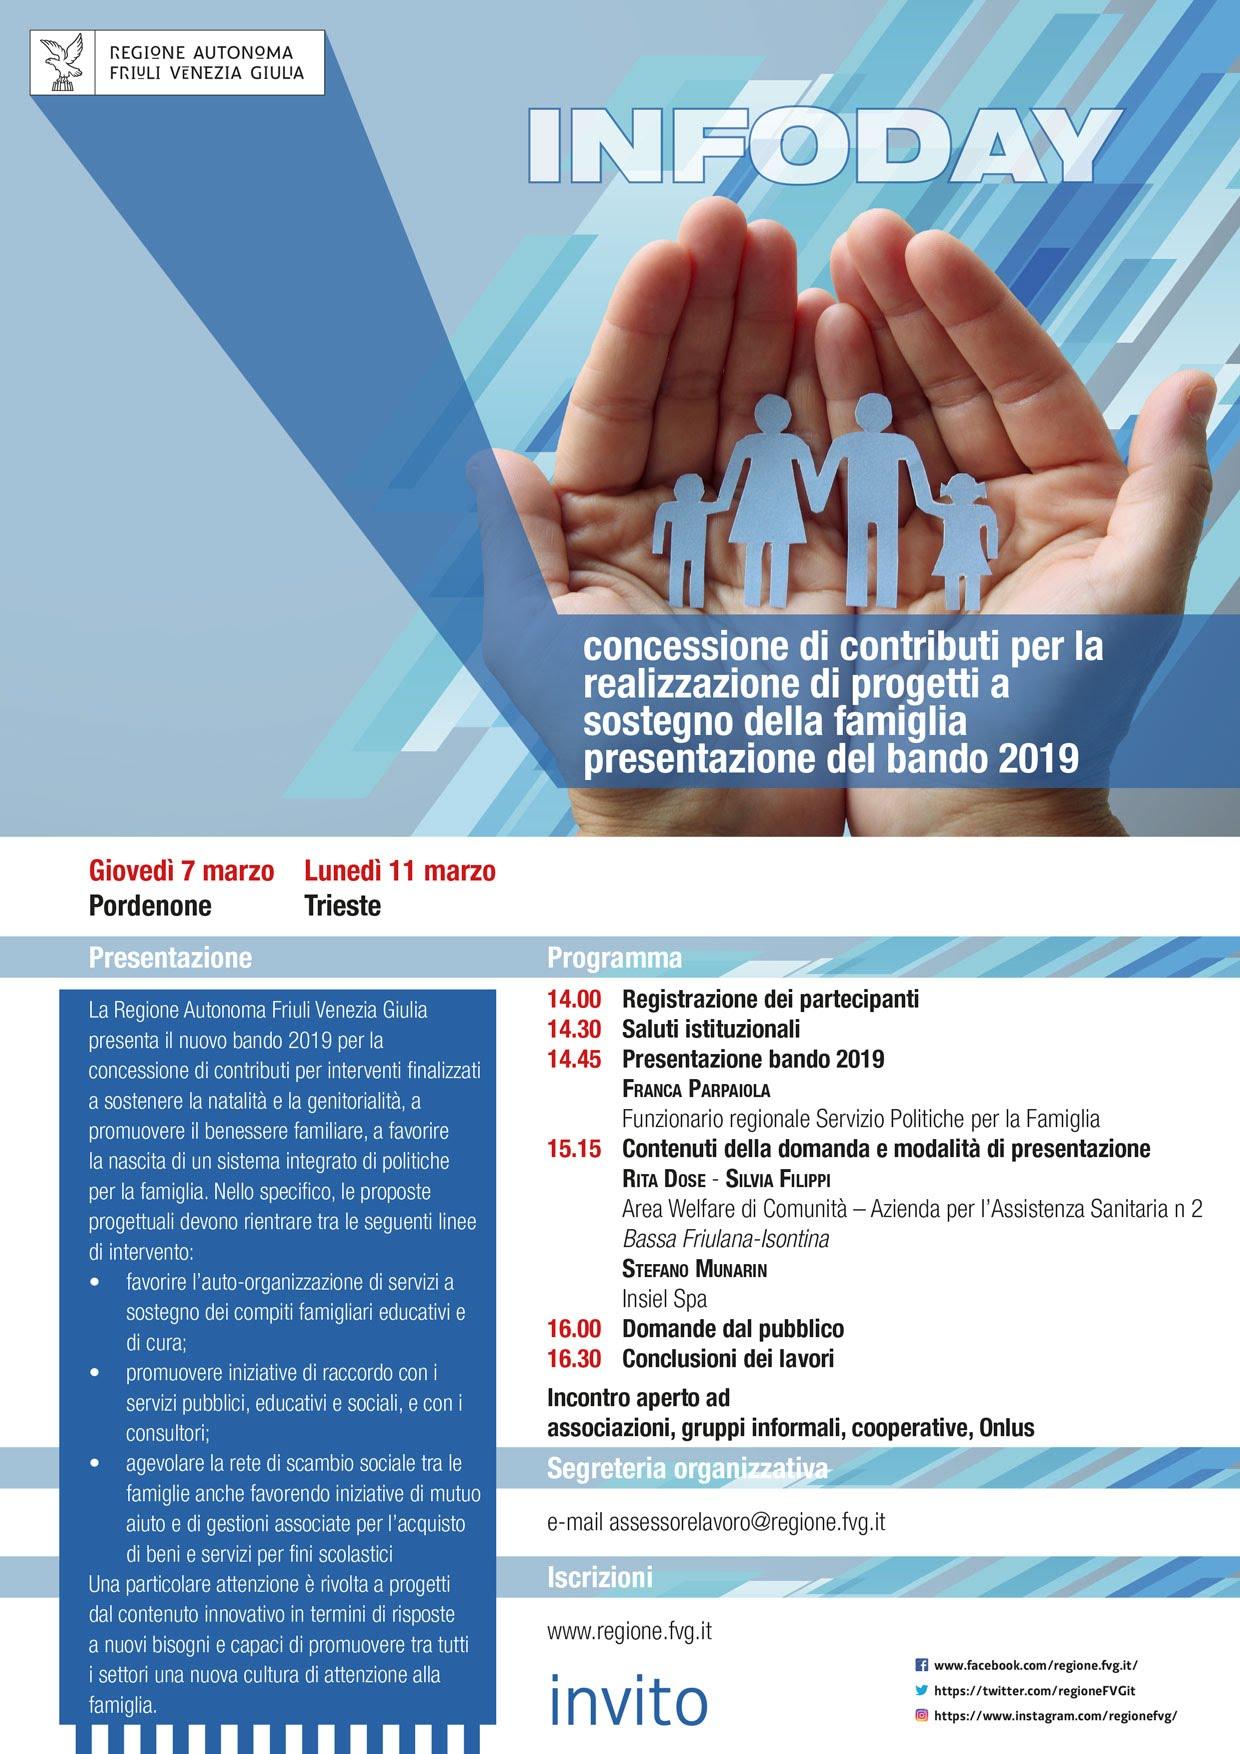 Programma infoday 2019